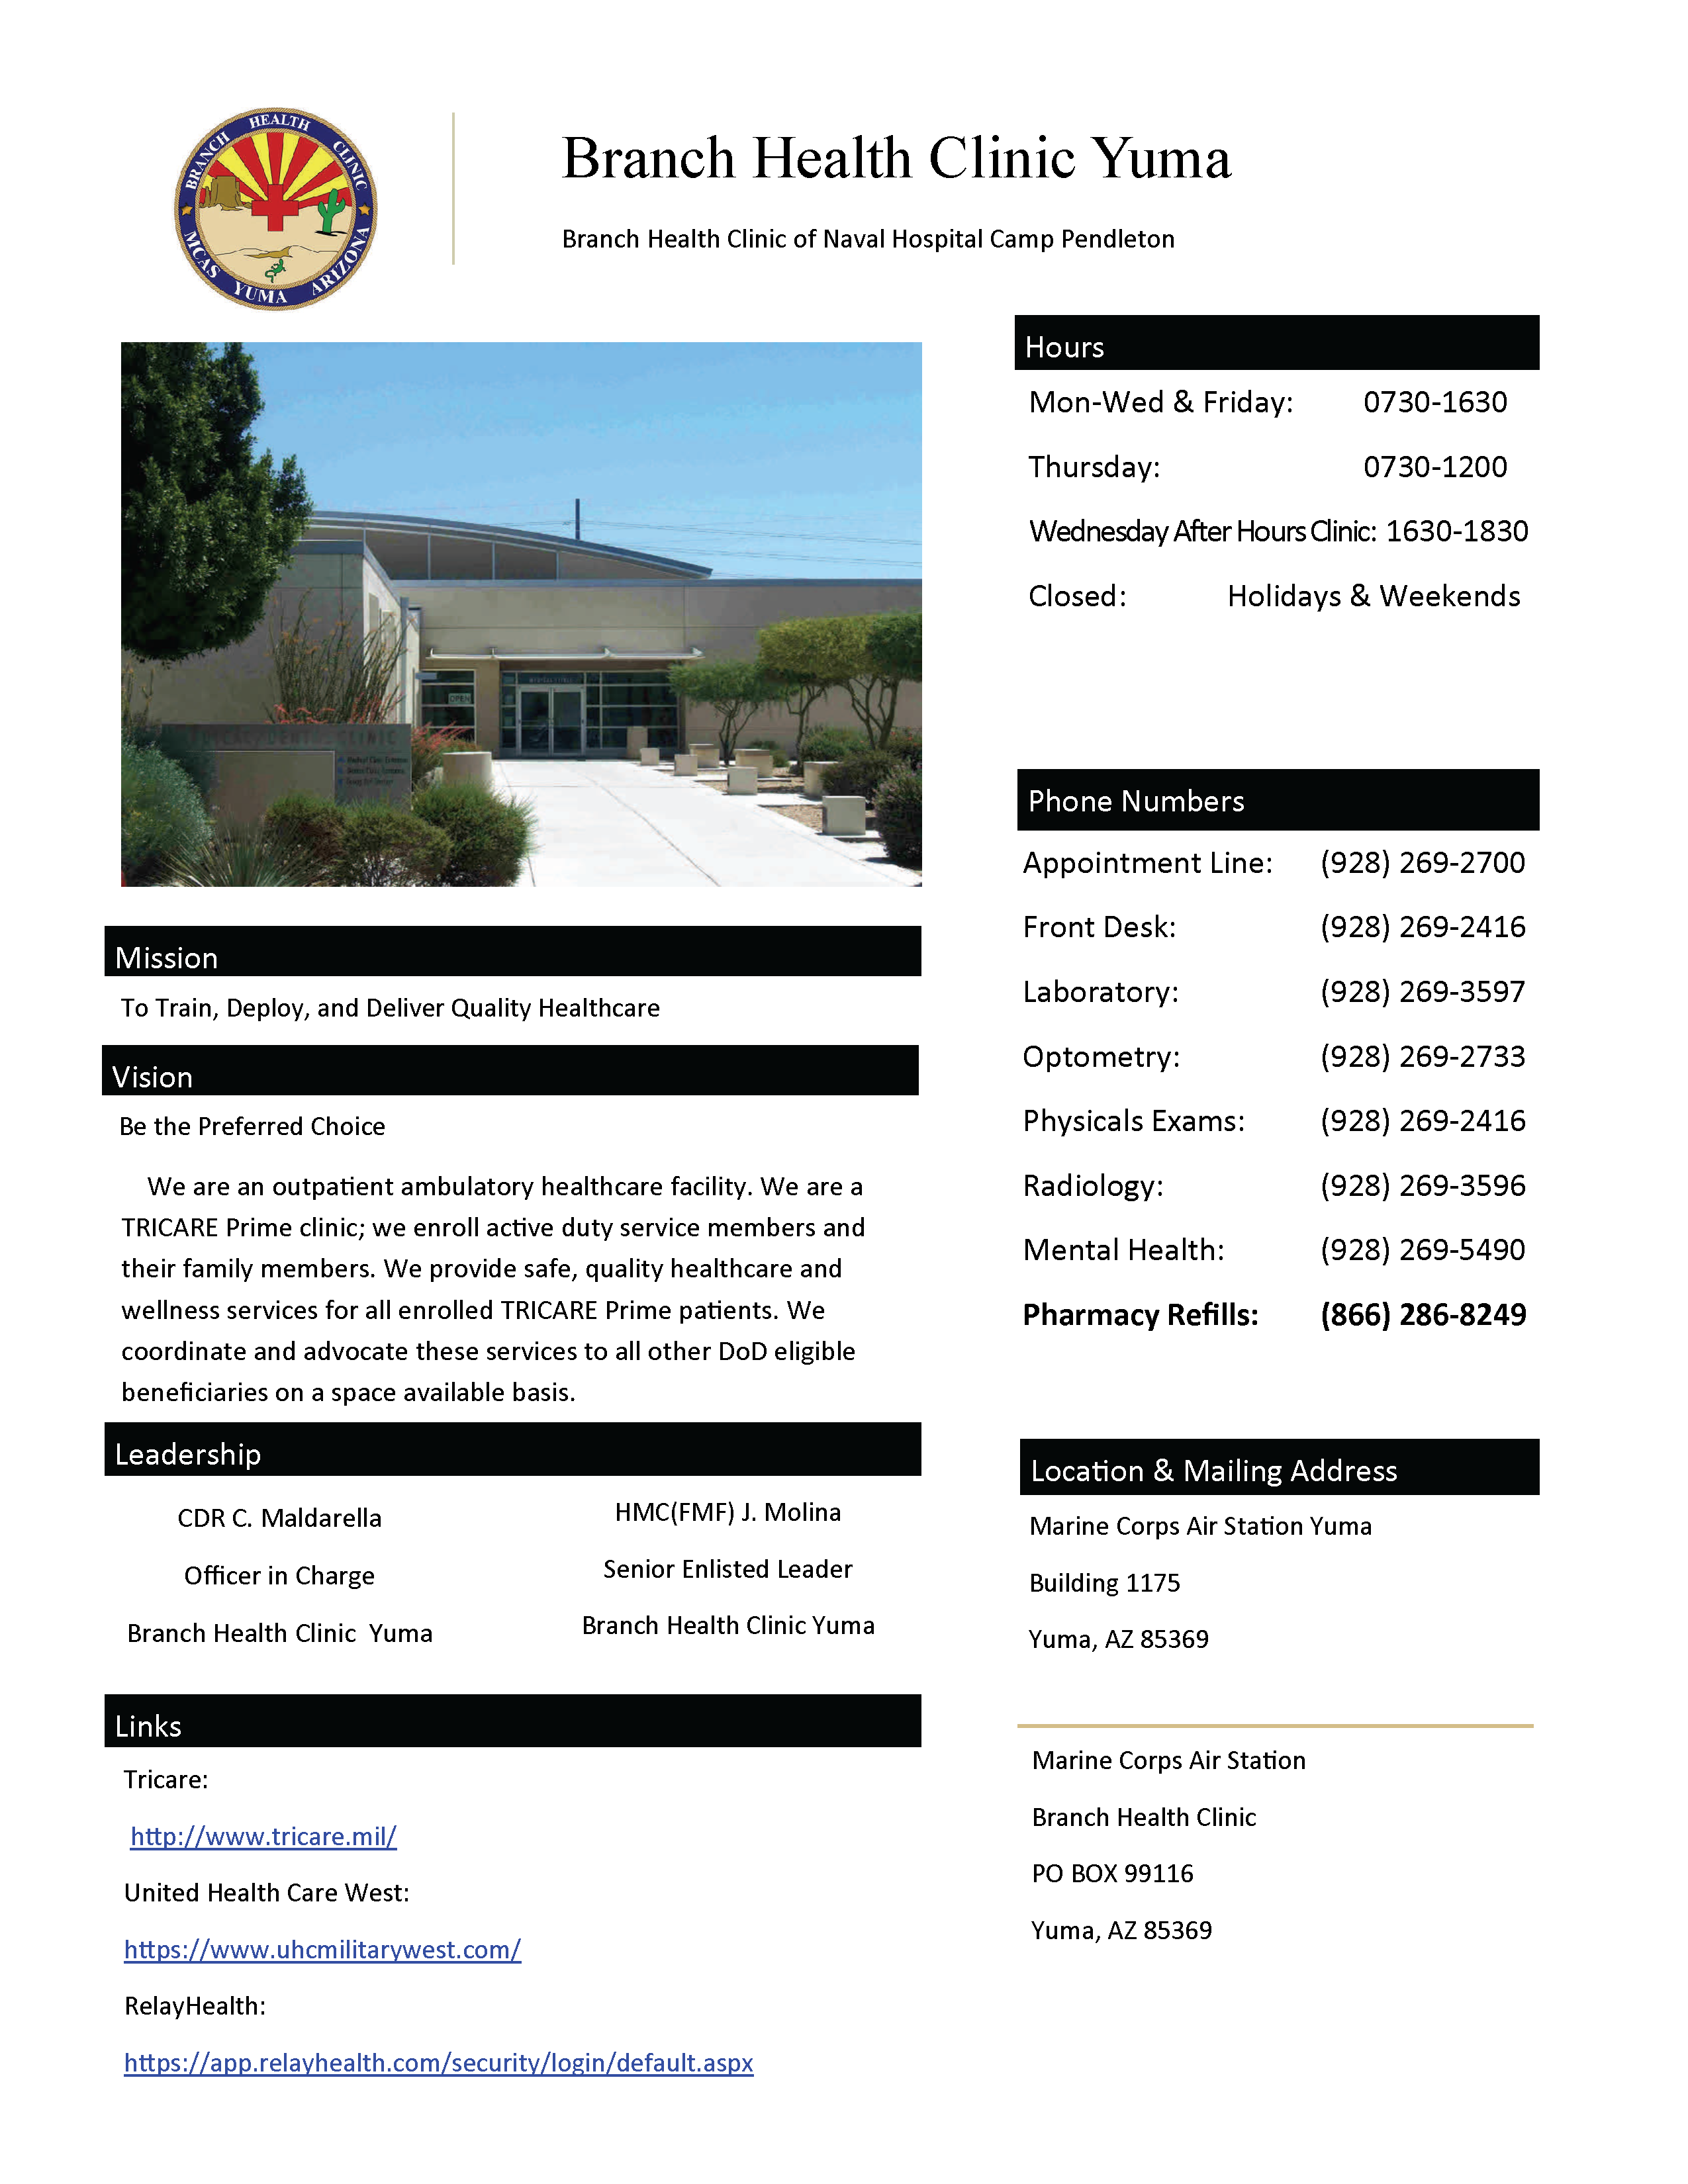 Marine Corps Air Station Yuma > Commands > Branch Health